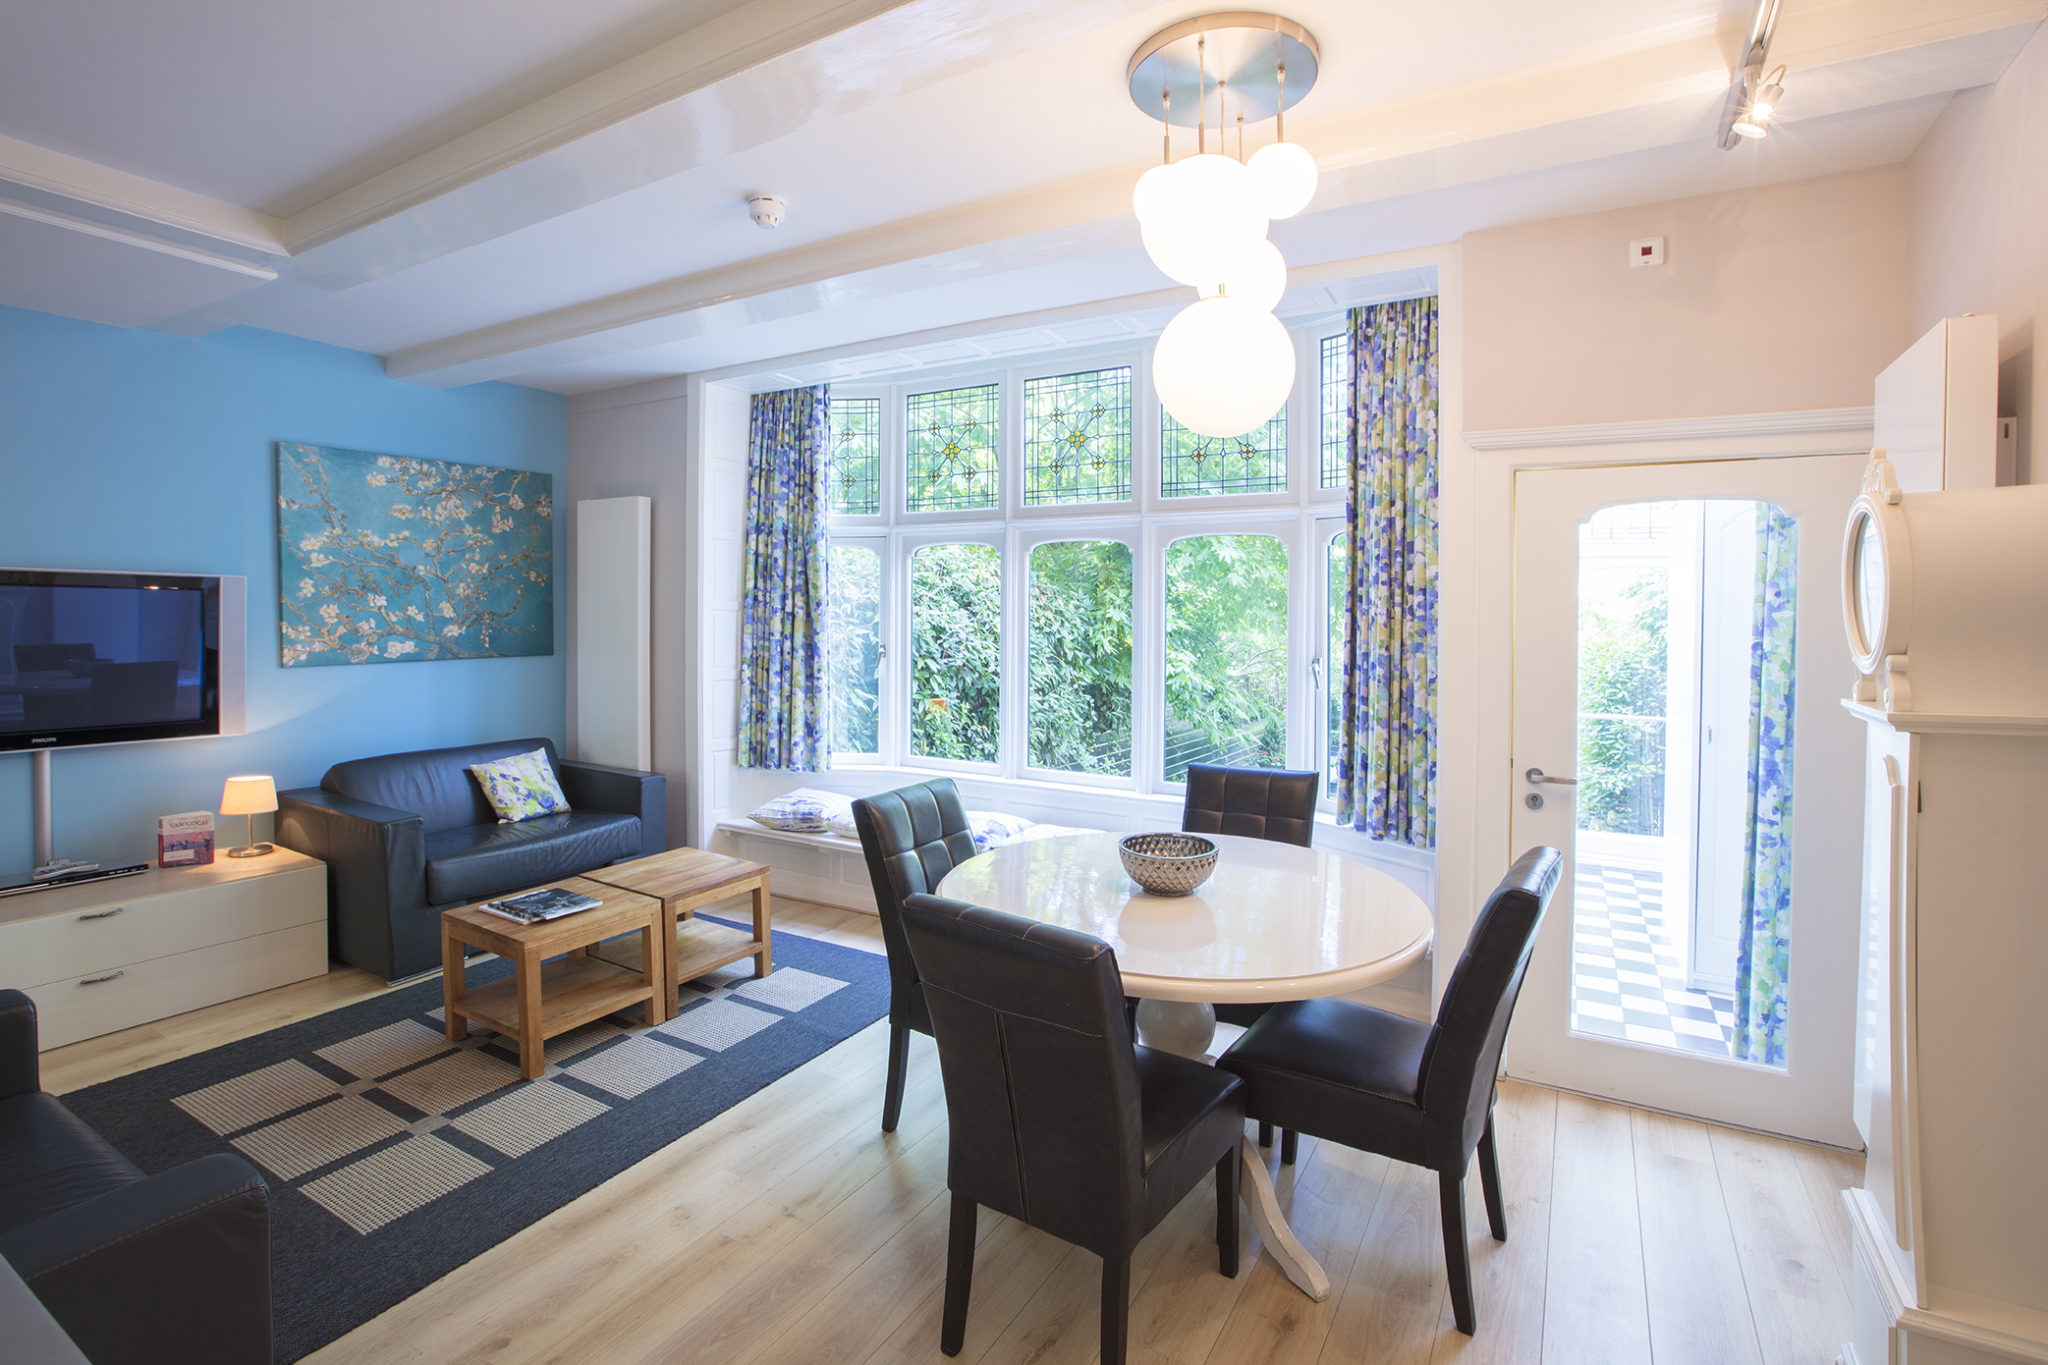 Dutch Masters Amsterdam Vincent van Gogh Apartment Livingroom © Michael van Oosten